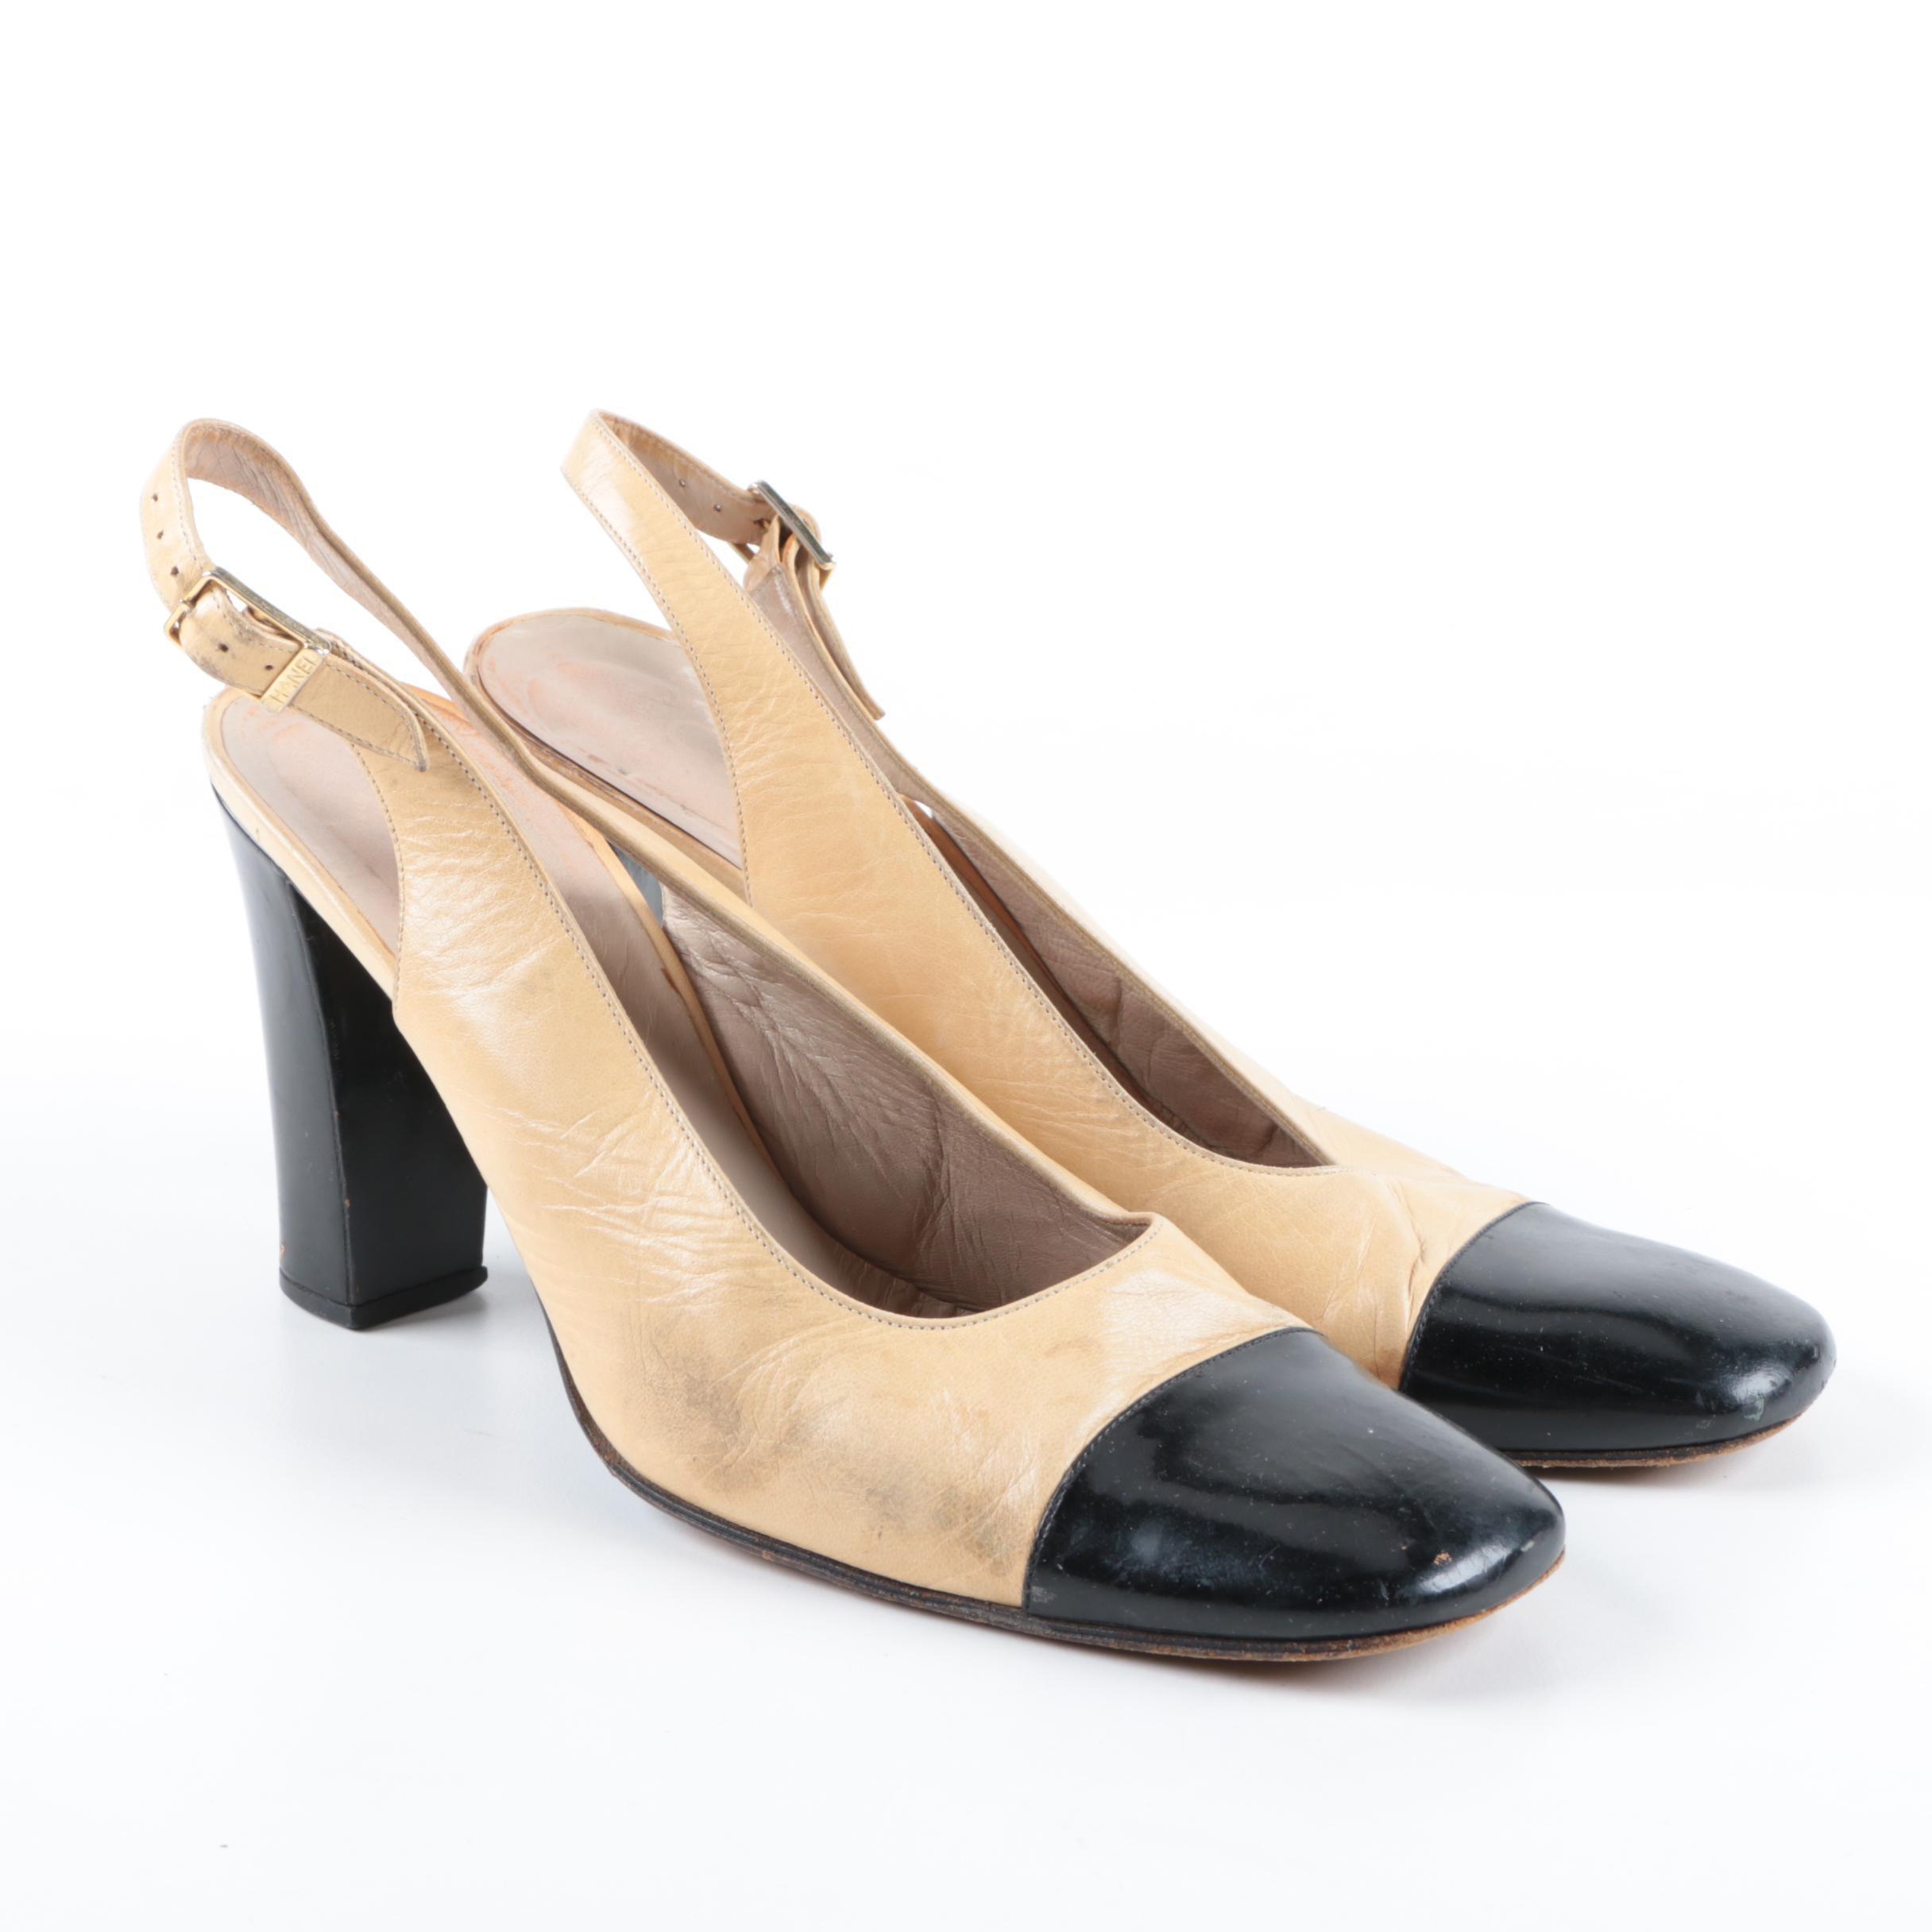 Women's Chanel Two Tone Leather Slingback Heels